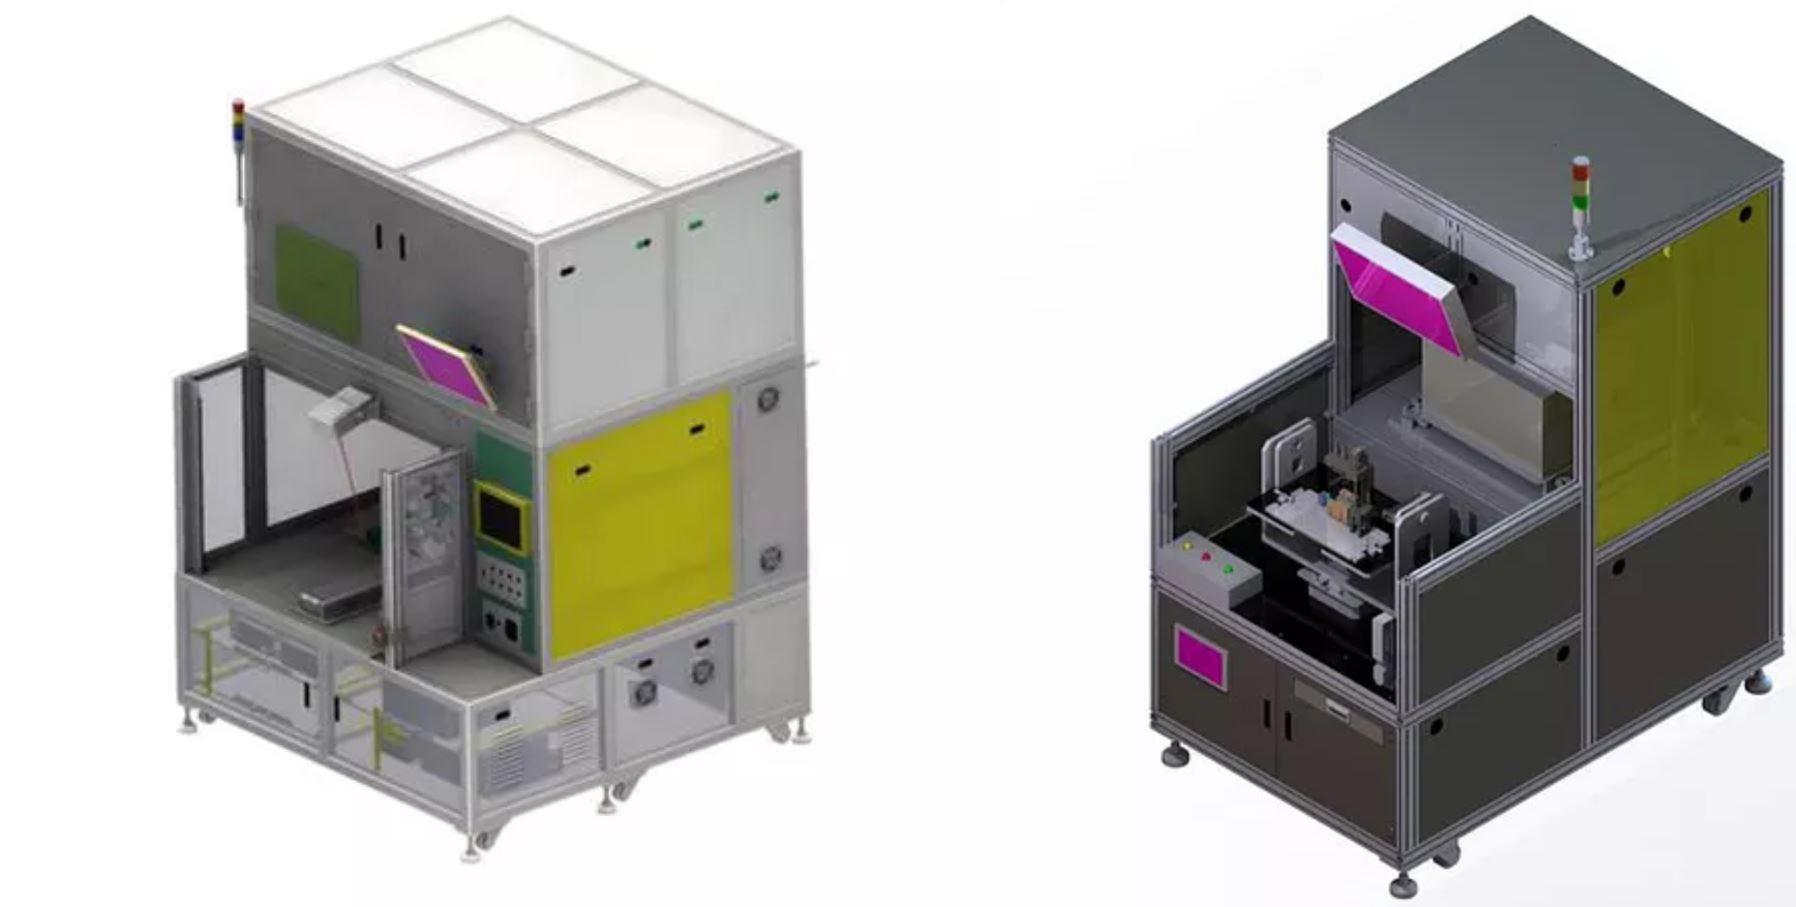 HLT600 맞춤 제작 제품 예시 이미지